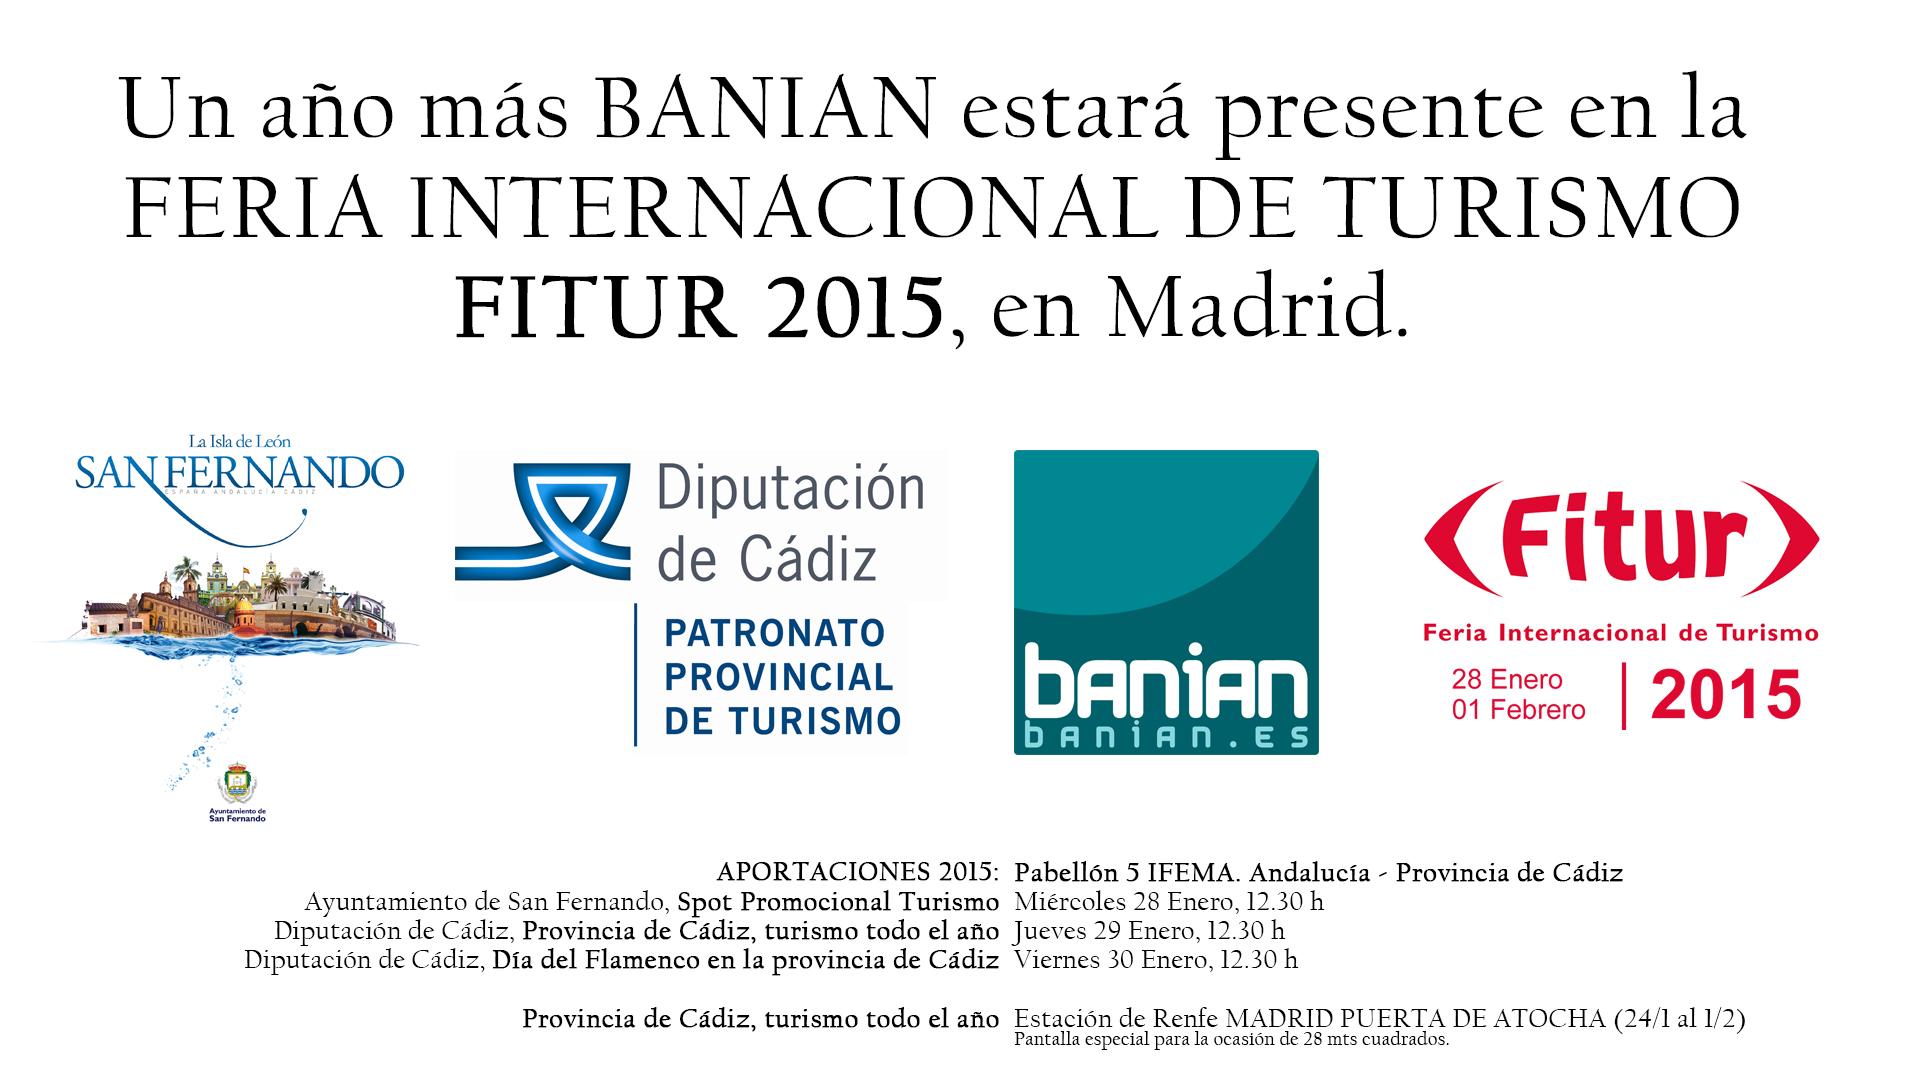 Fitur 2015 Banian Diputacion Cadiz Ayuntamiento San Fernando Turismo